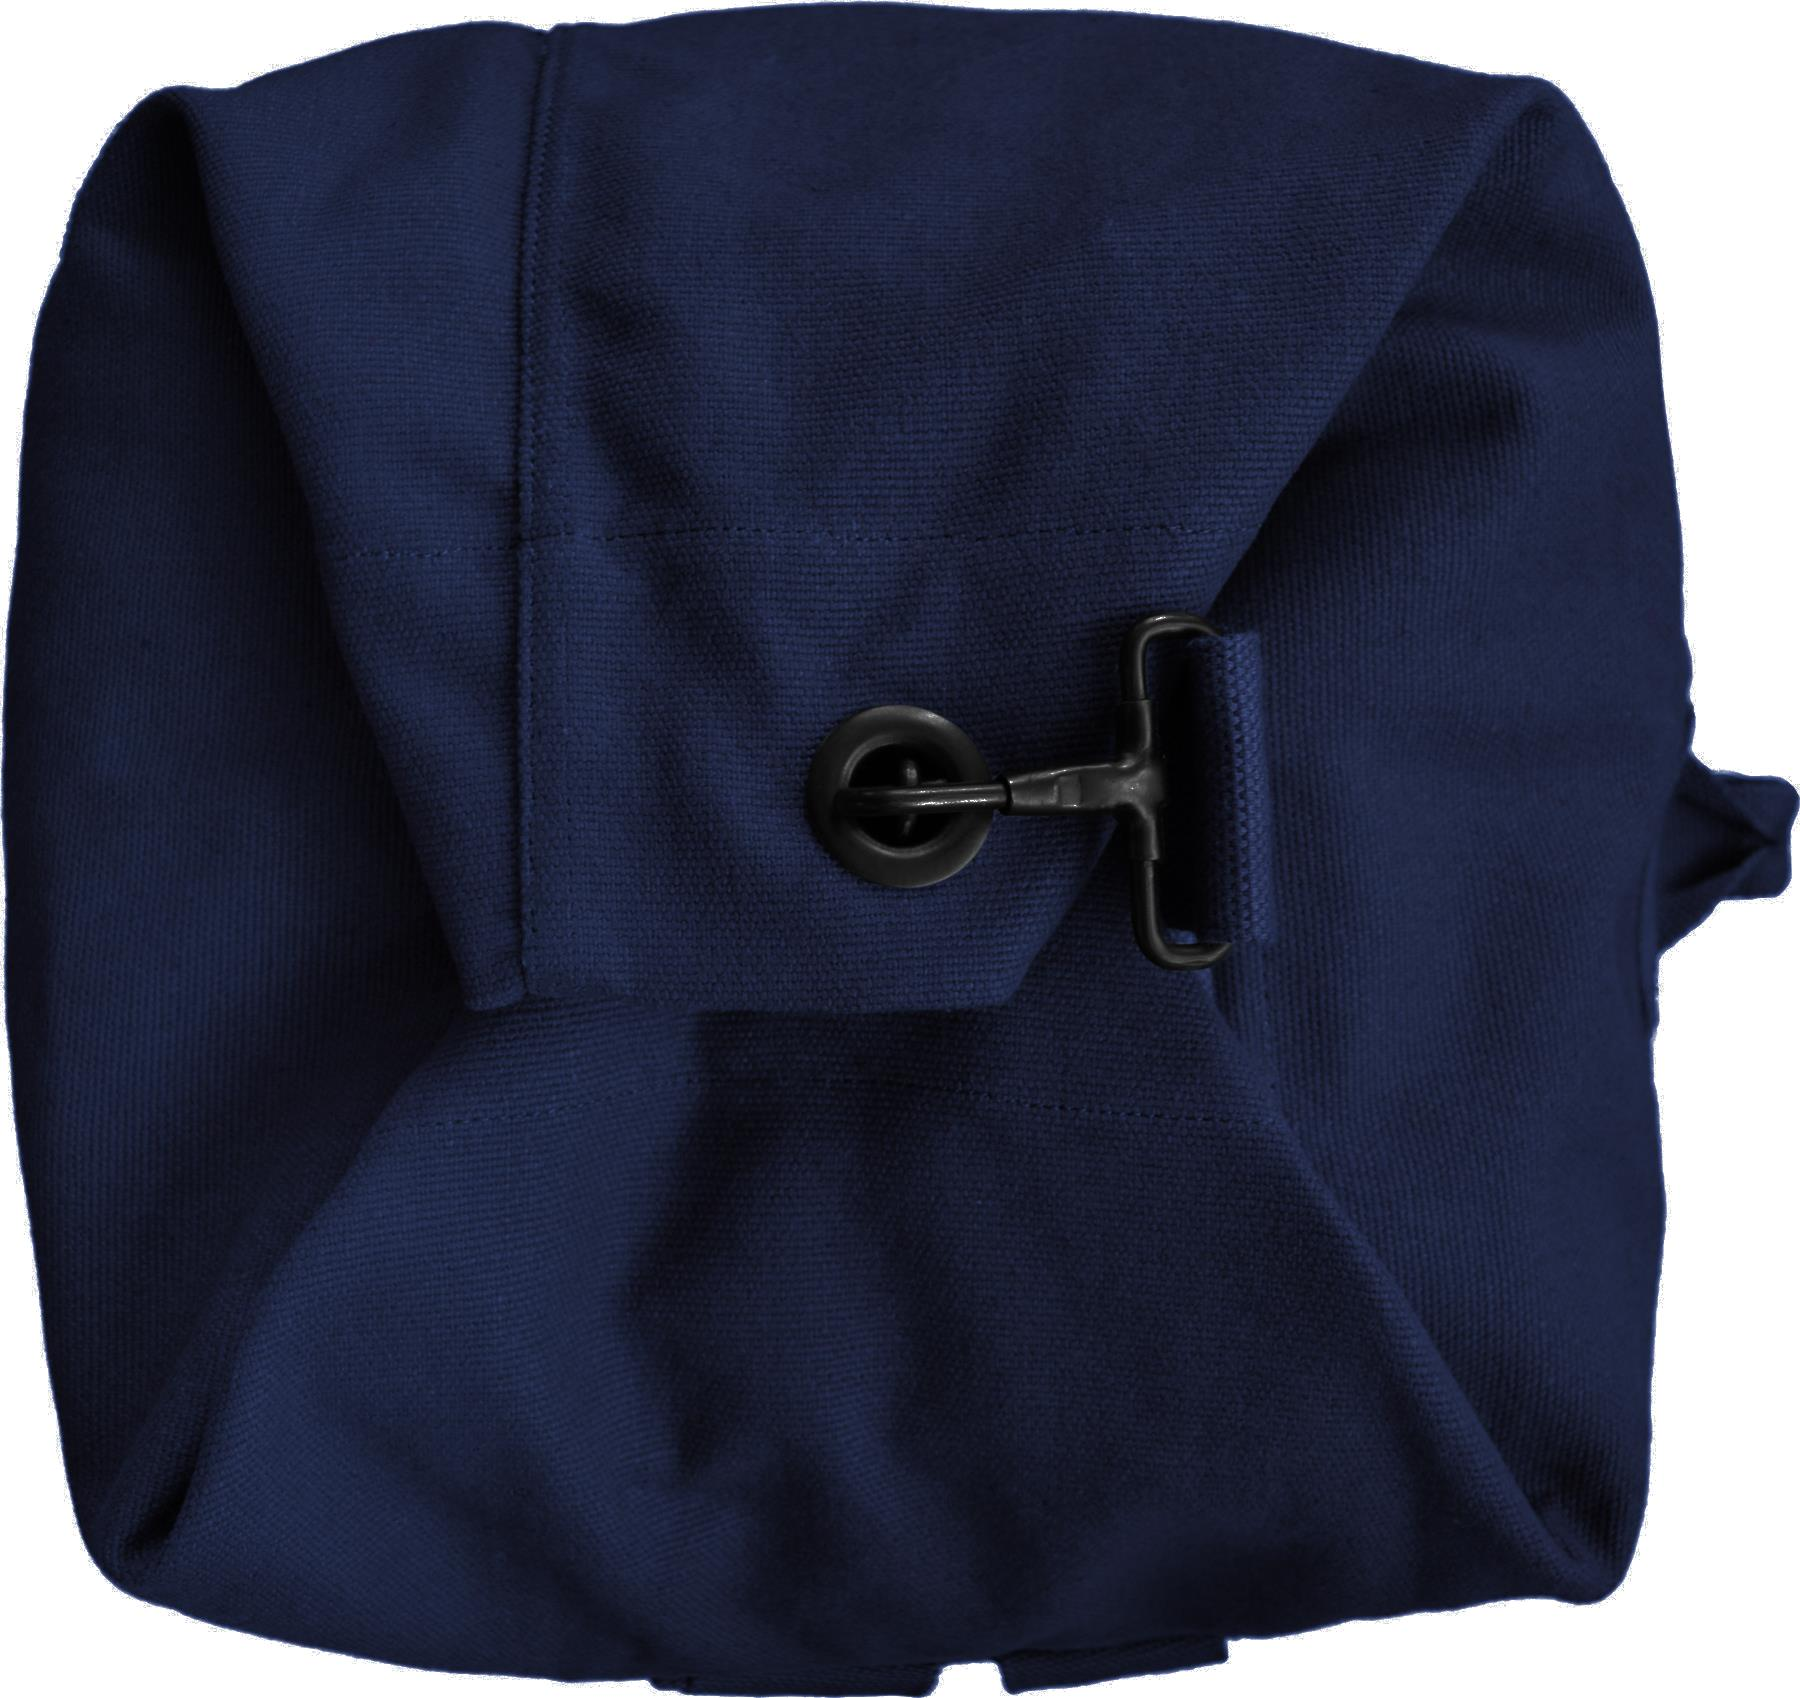 Canvas-Seesack 90 Liter Seemannstasche BW Transportsack Duffle Bag mitDoppelgurt